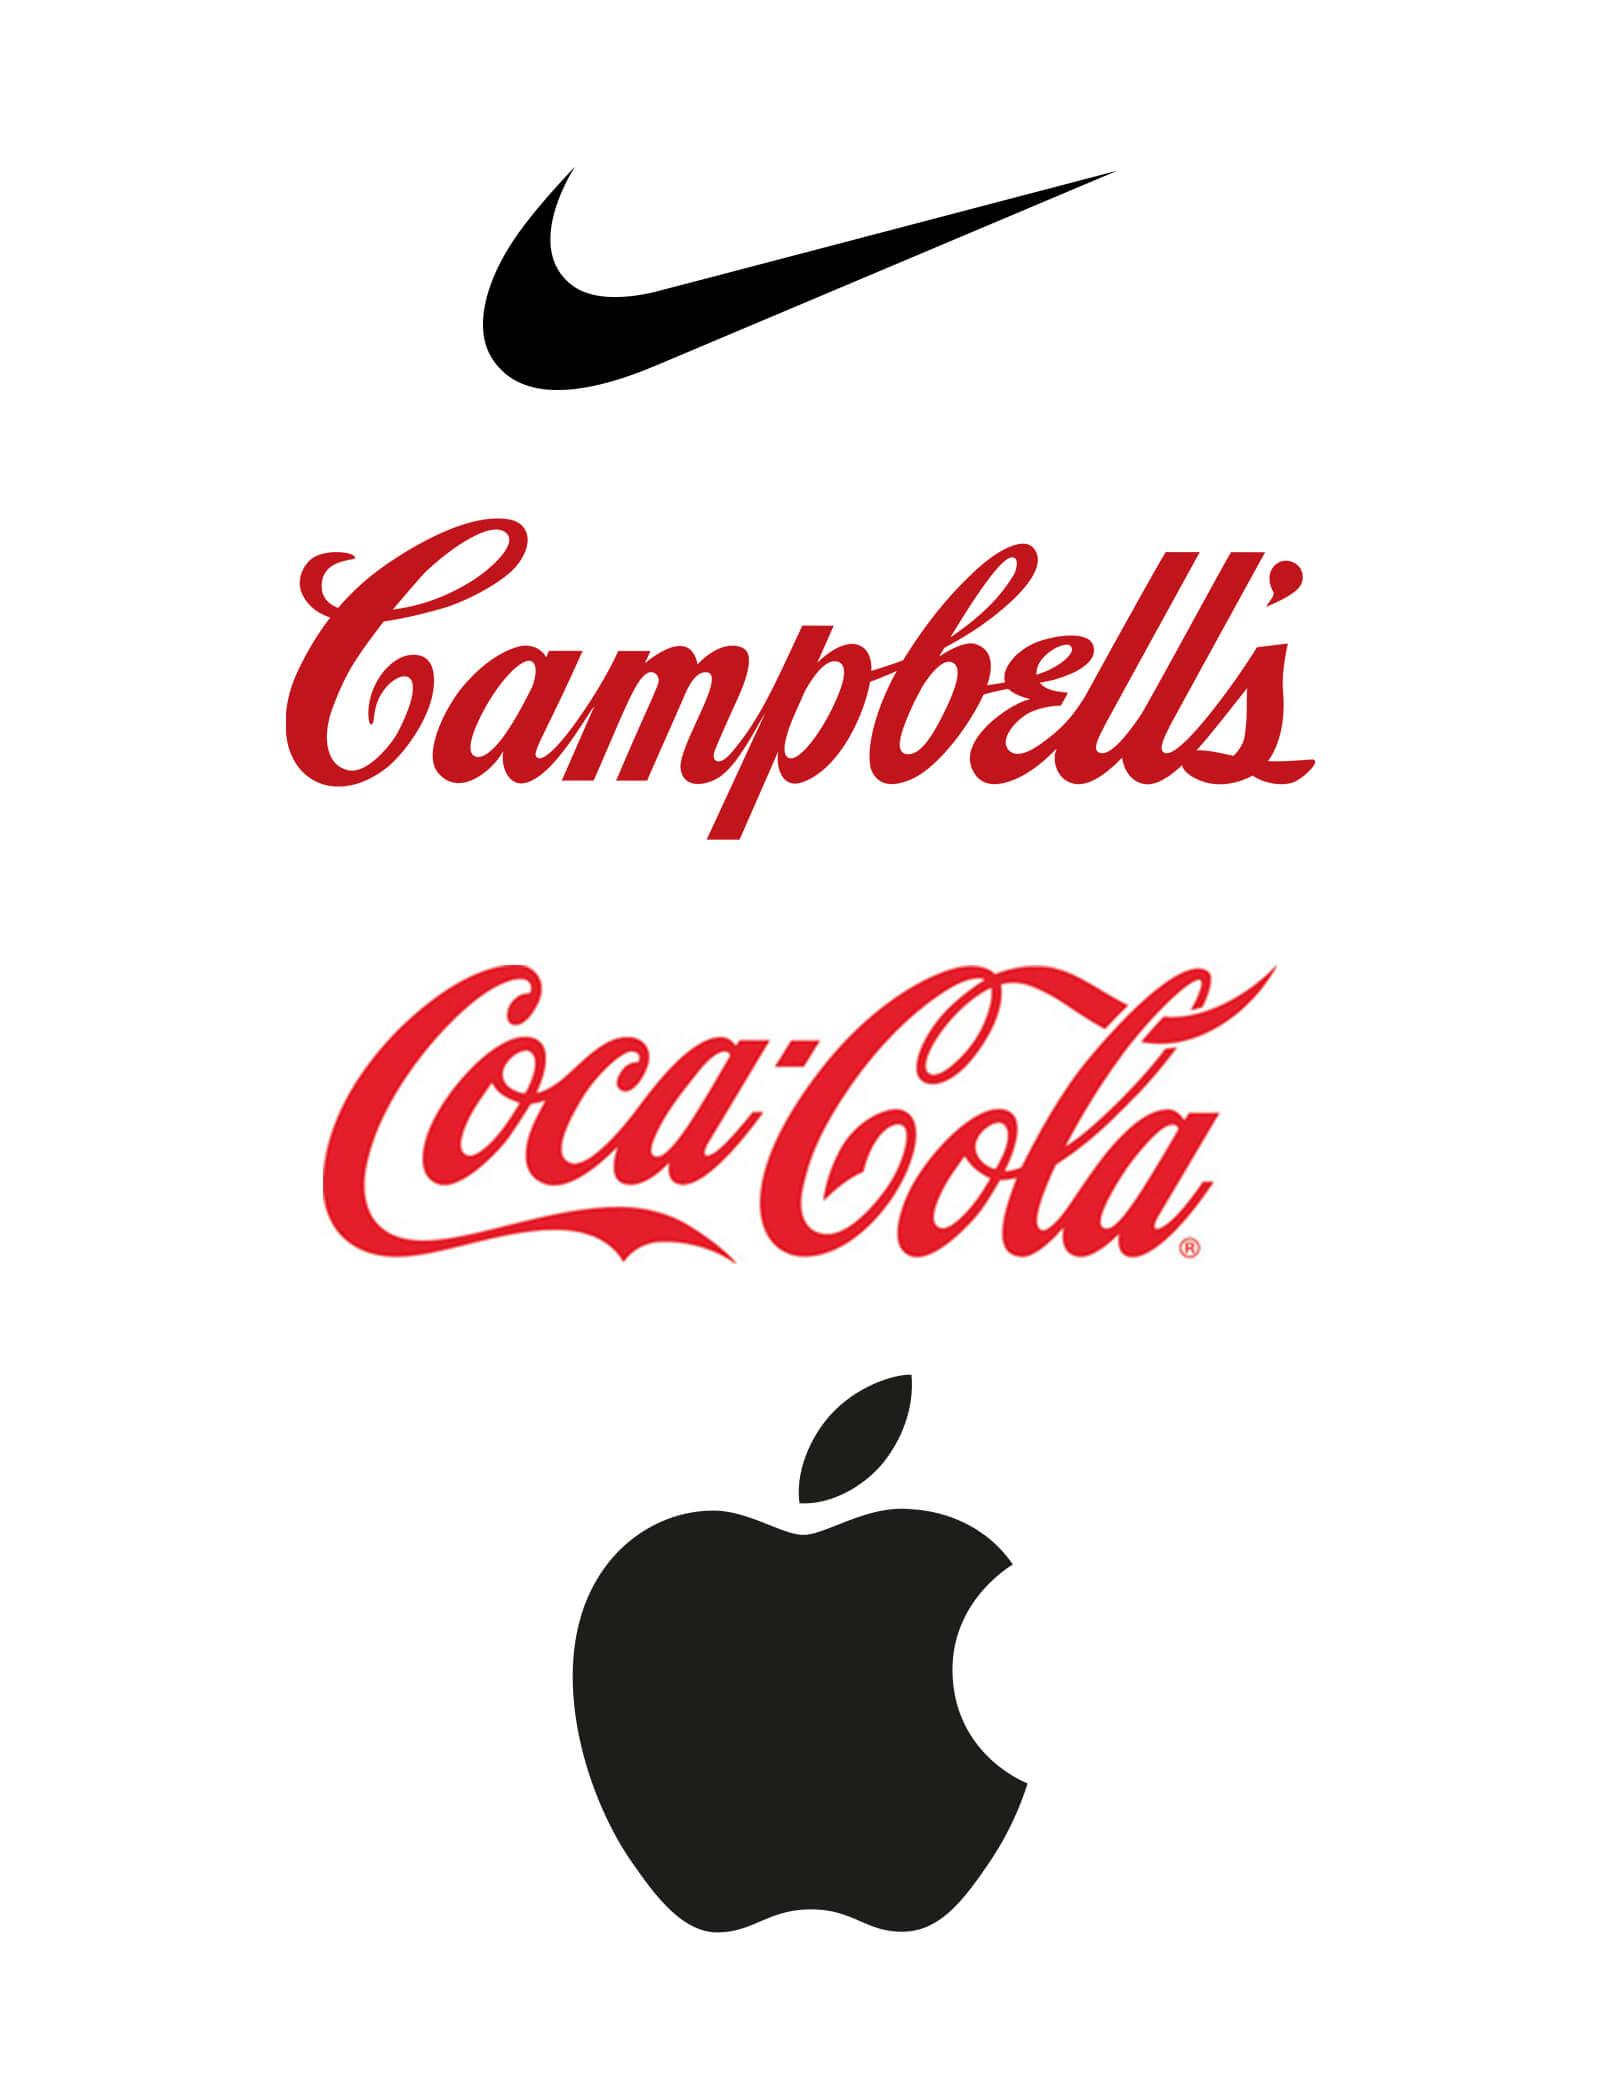 big brand logos nike coca cola apple campbells fridge. Black Bedroom Furniture Sets. Home Design Ideas